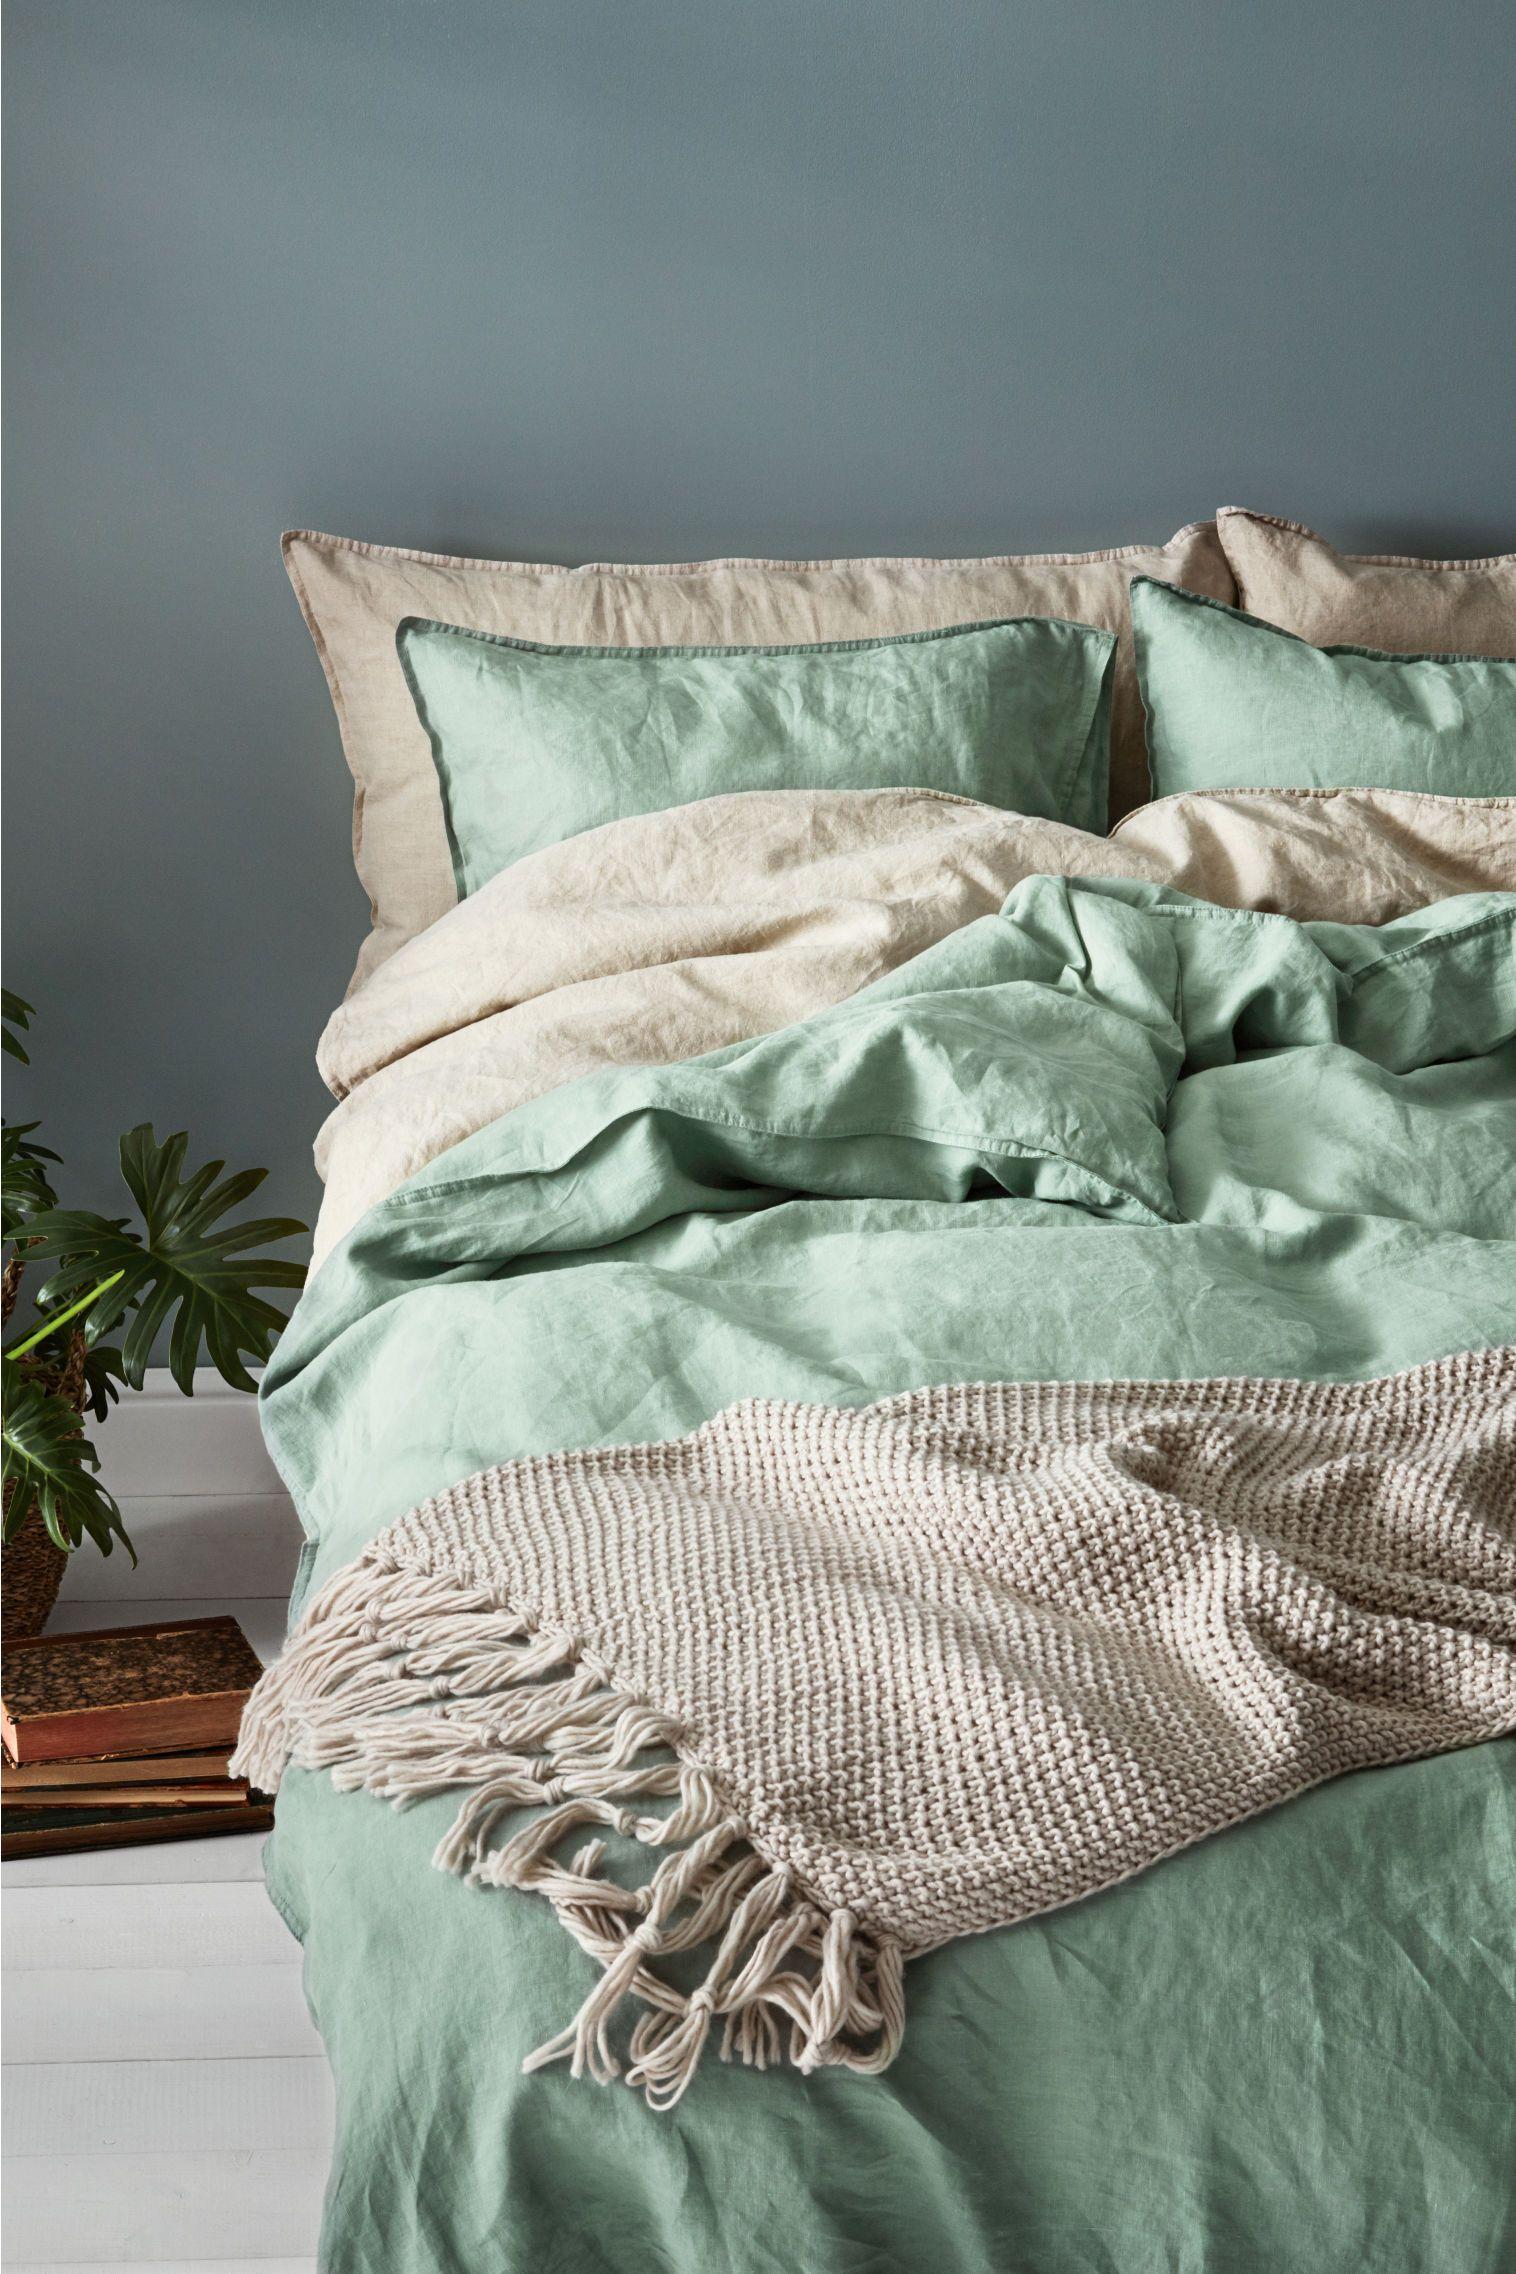 Washed Linen Duvet Cover Set Dusky Green Home All H M Gb Washed Linen Duvet Cover Bed Linen Design Bed Linens Luxury